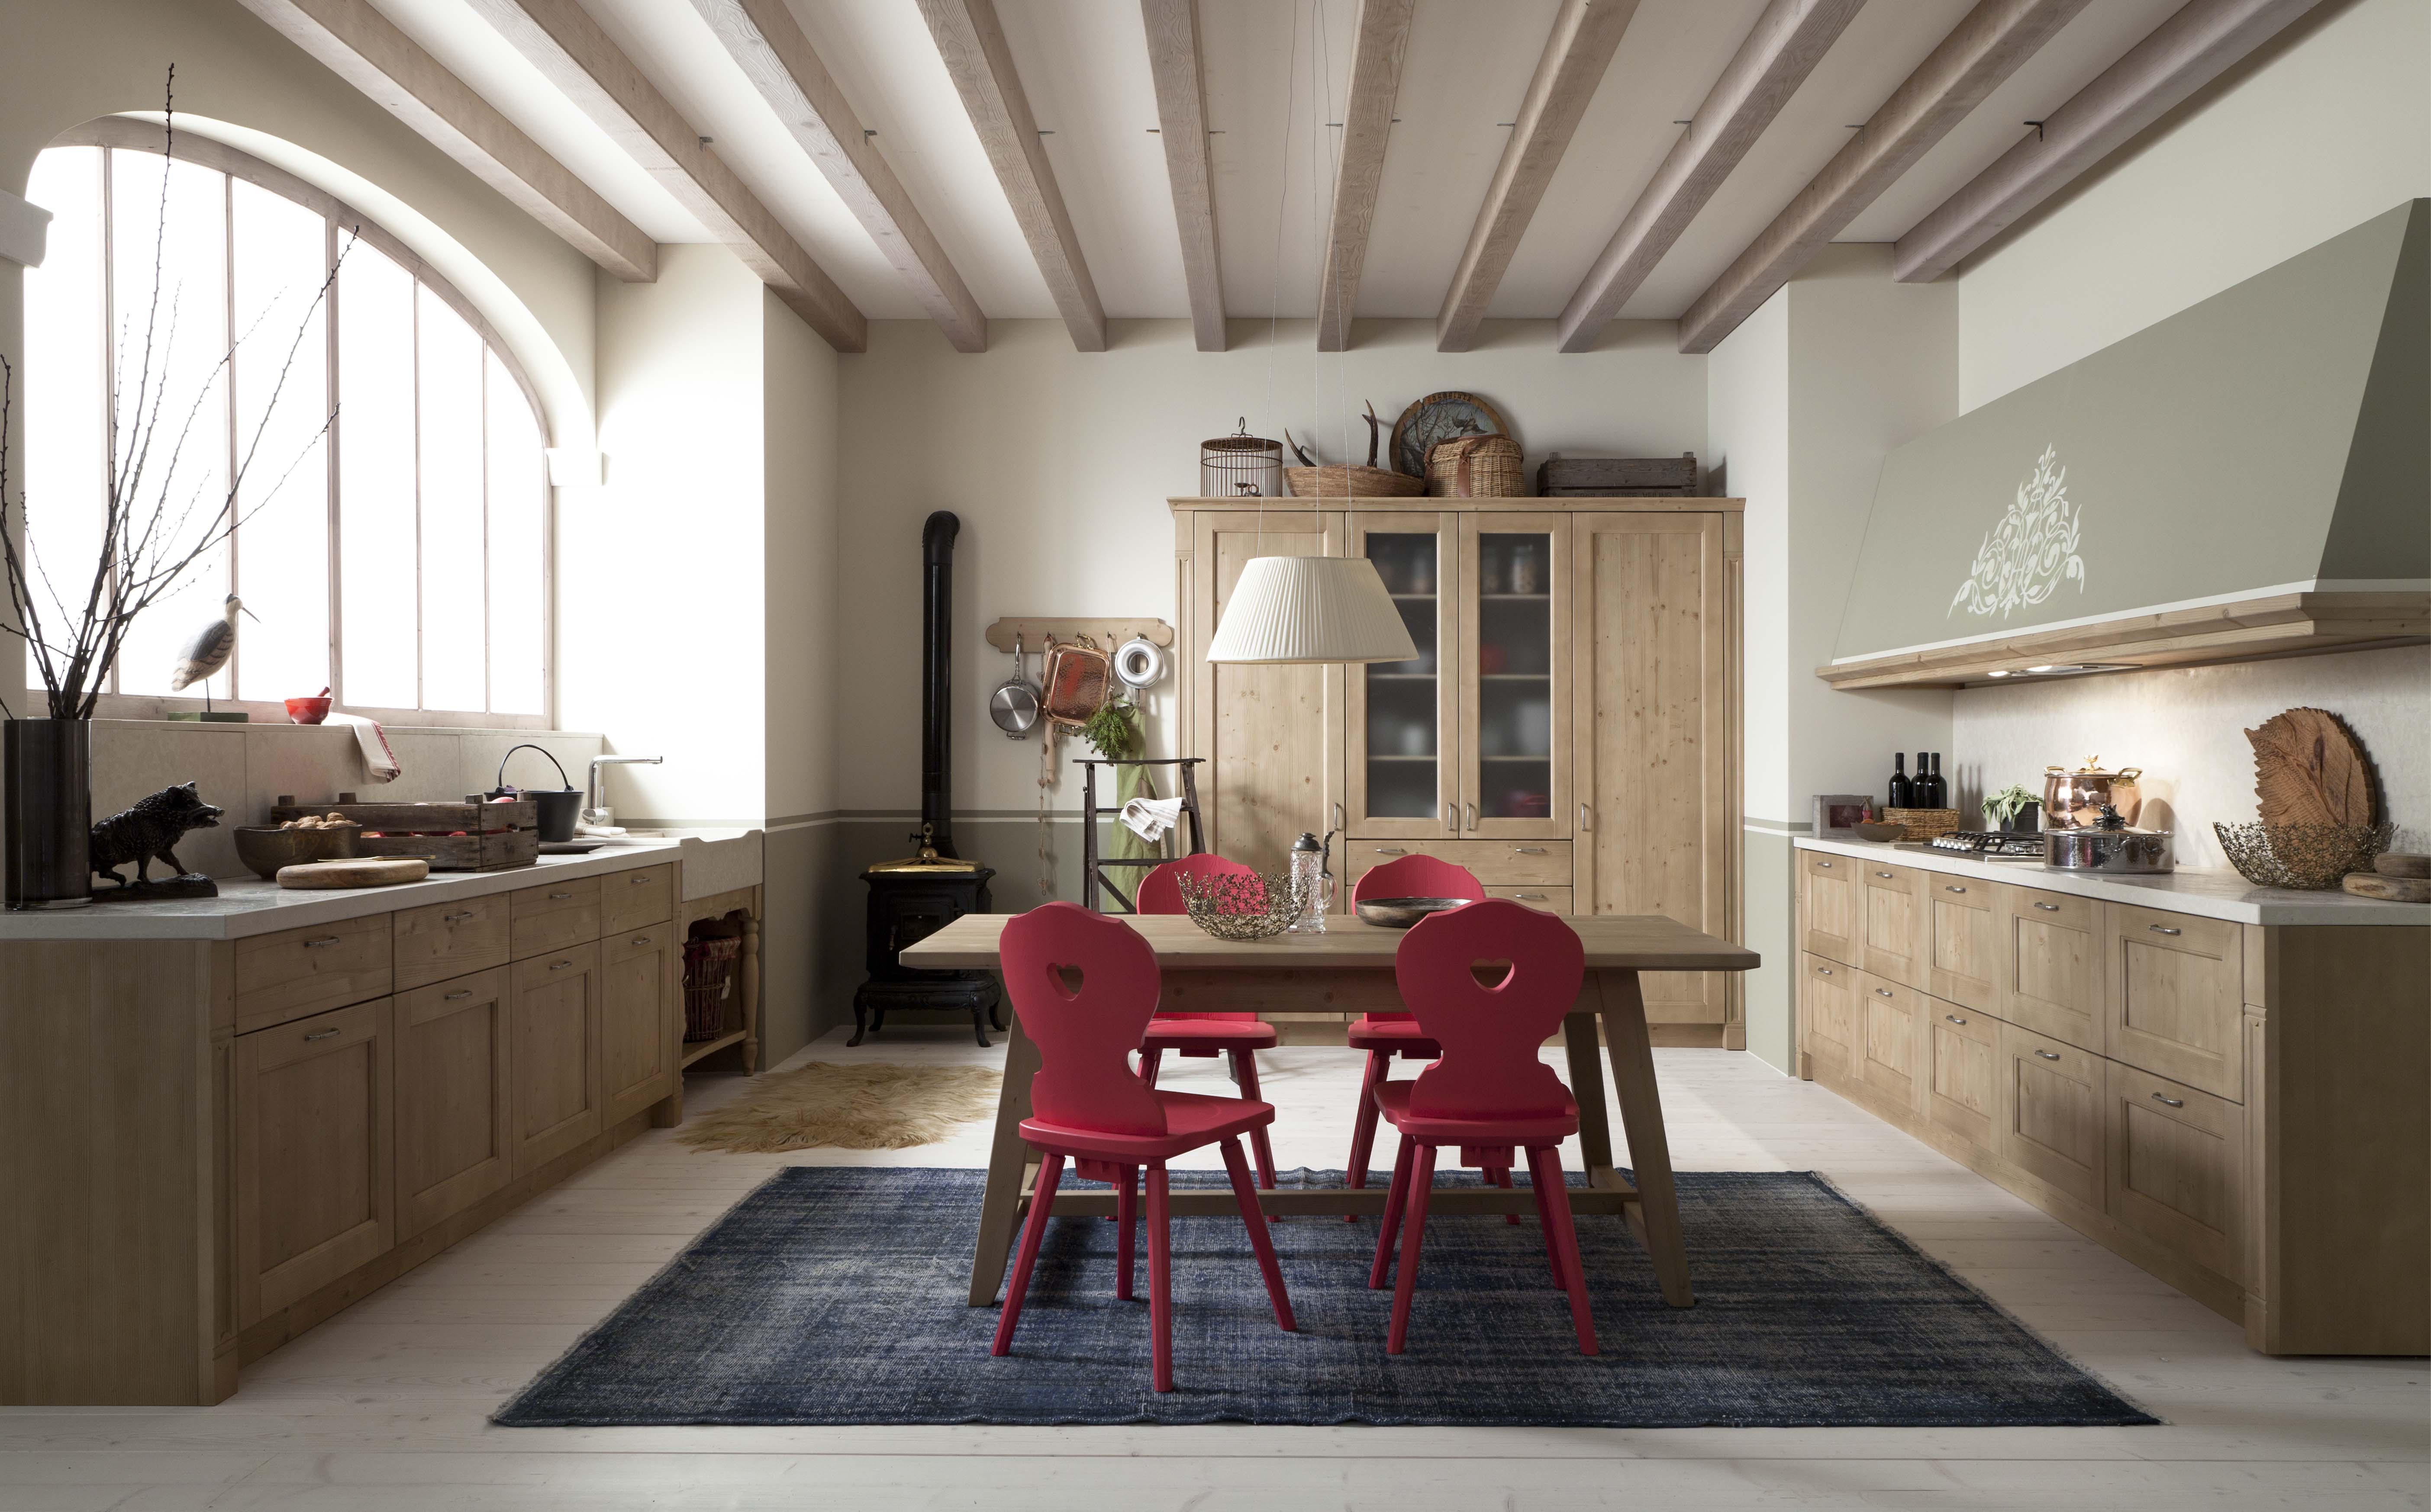 Dipingere mobili cucina best mobili rovinati dalluacqua with dipingere mobili cucina latest - Dipingere i mobili della cucina ...